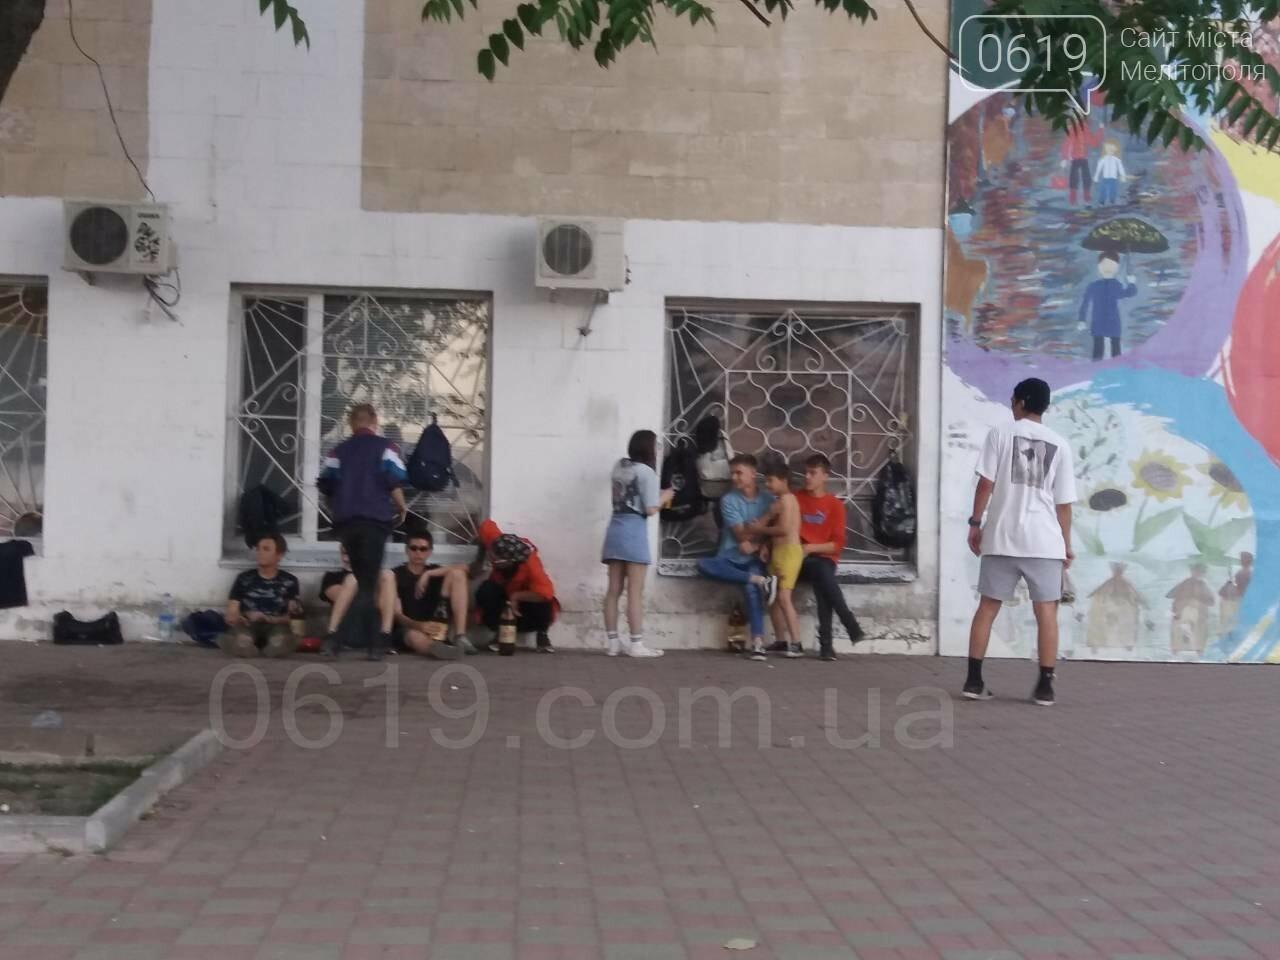 Мелитопольская молодежь превратила центр города в притон, - ФОТО, фото-1, Фото сайта 0619